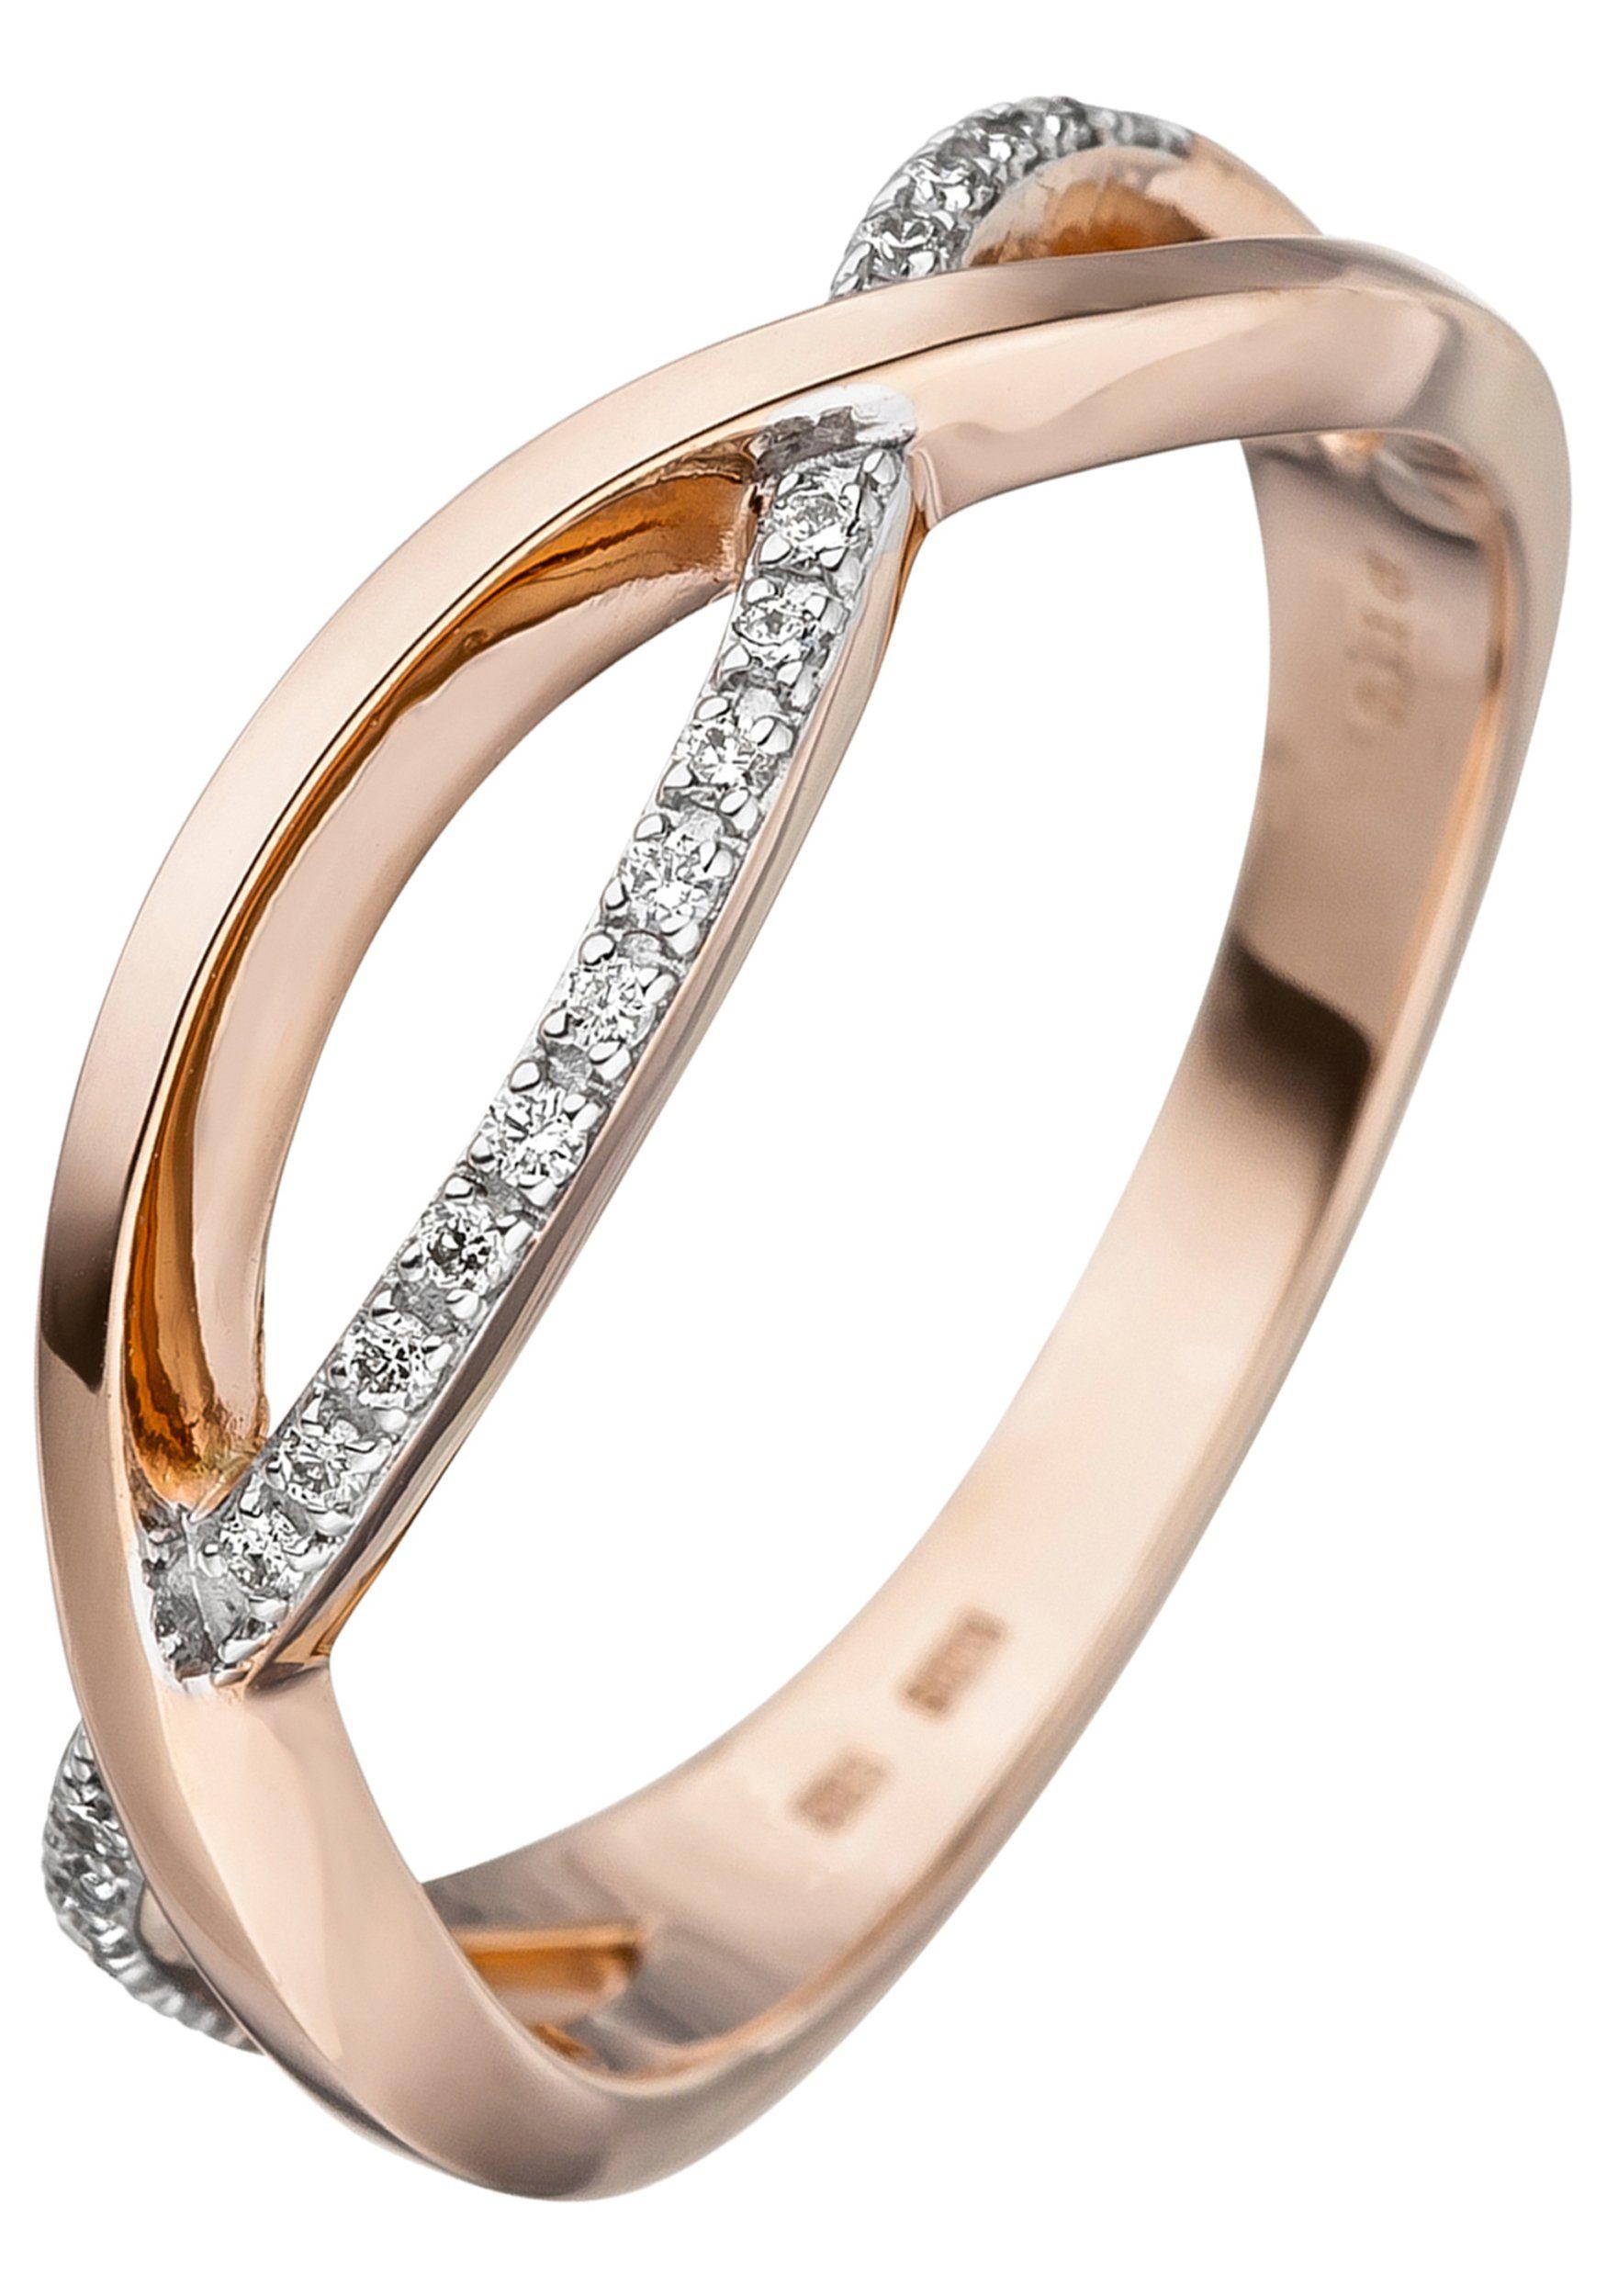 JOBO Diamantring 585 Roségold bicolor mit 20 Diamanten